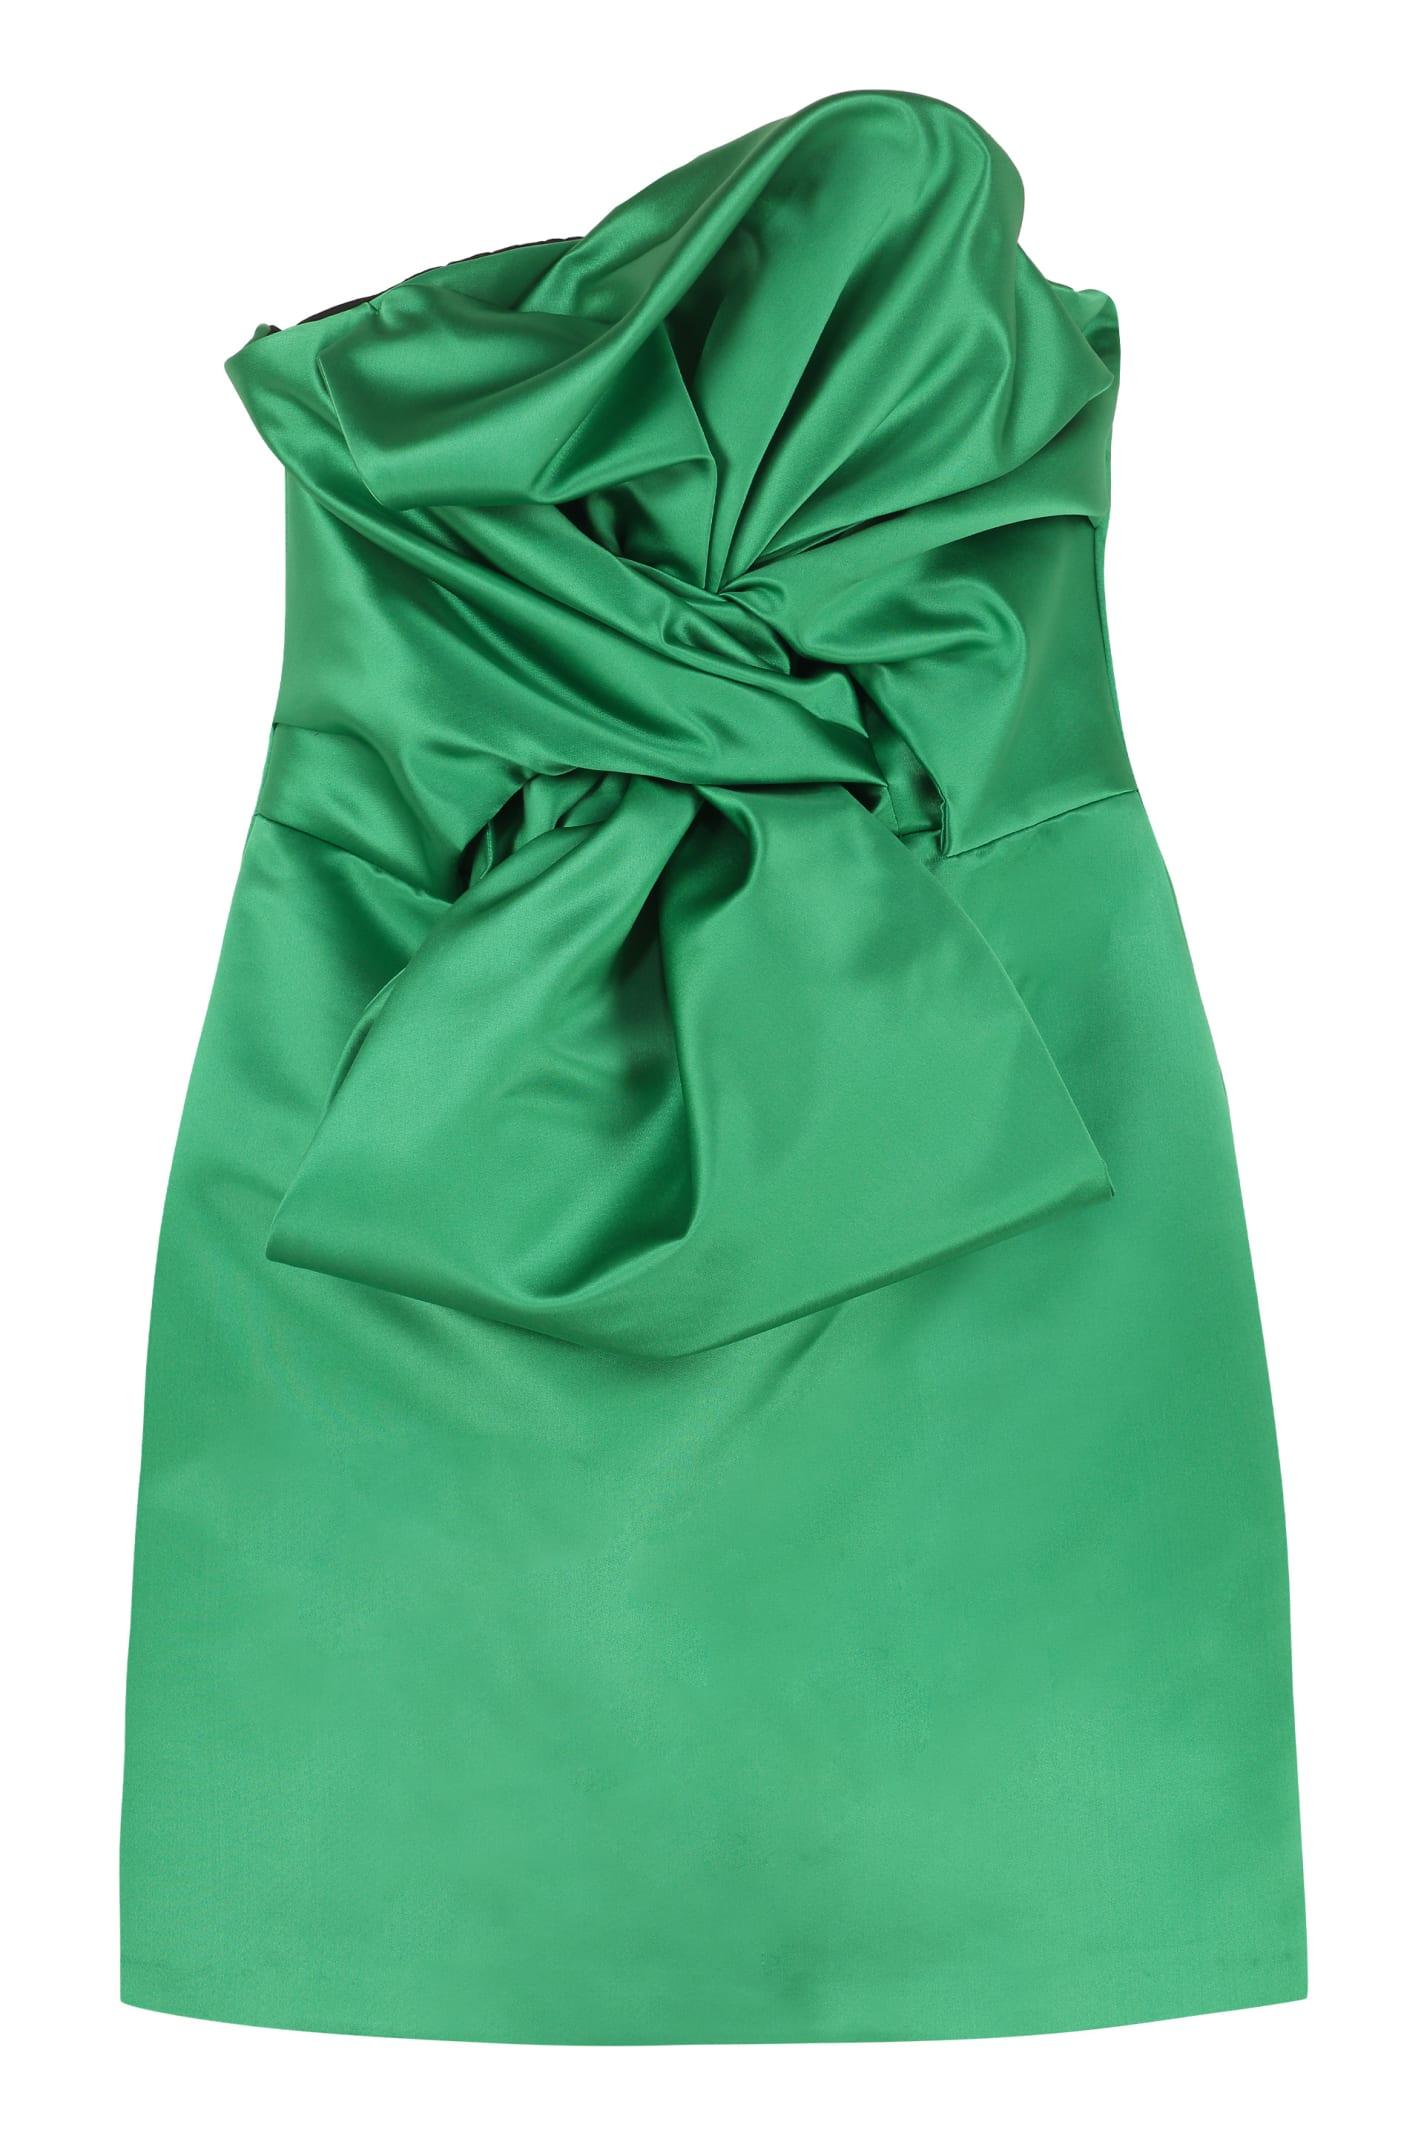 Buy Giuseppe di Morabito Satin Bustier Dress With Maxi Bow online, shop Giuseppe di Morabito with free shipping